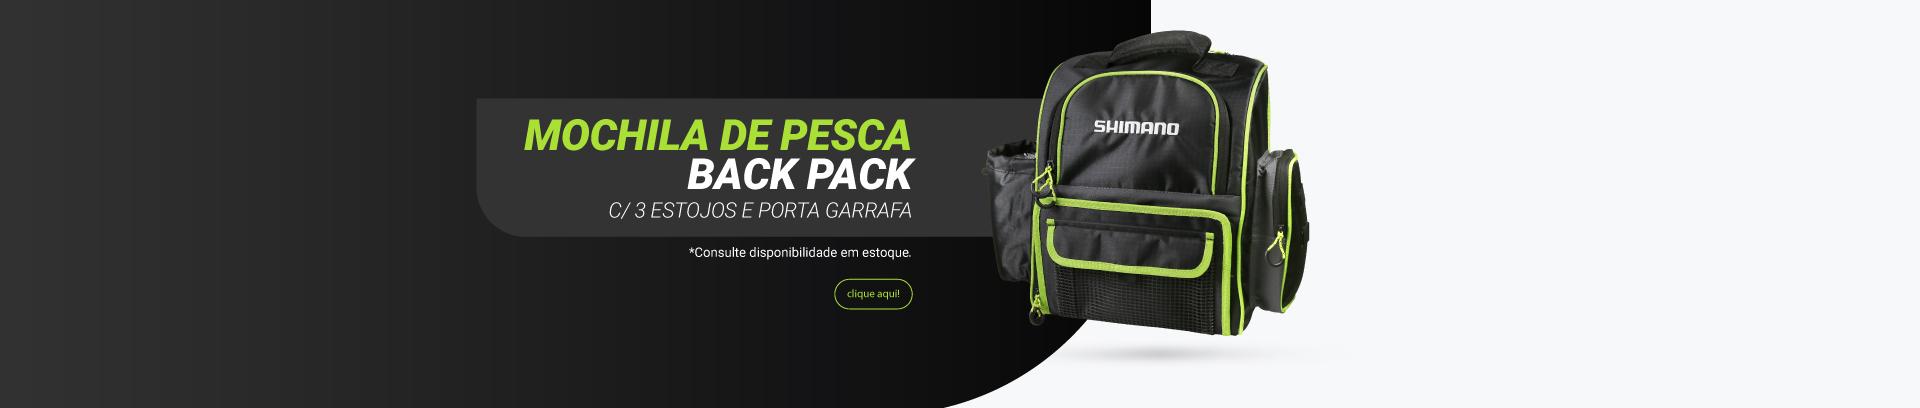 Mochila-Back-Pack